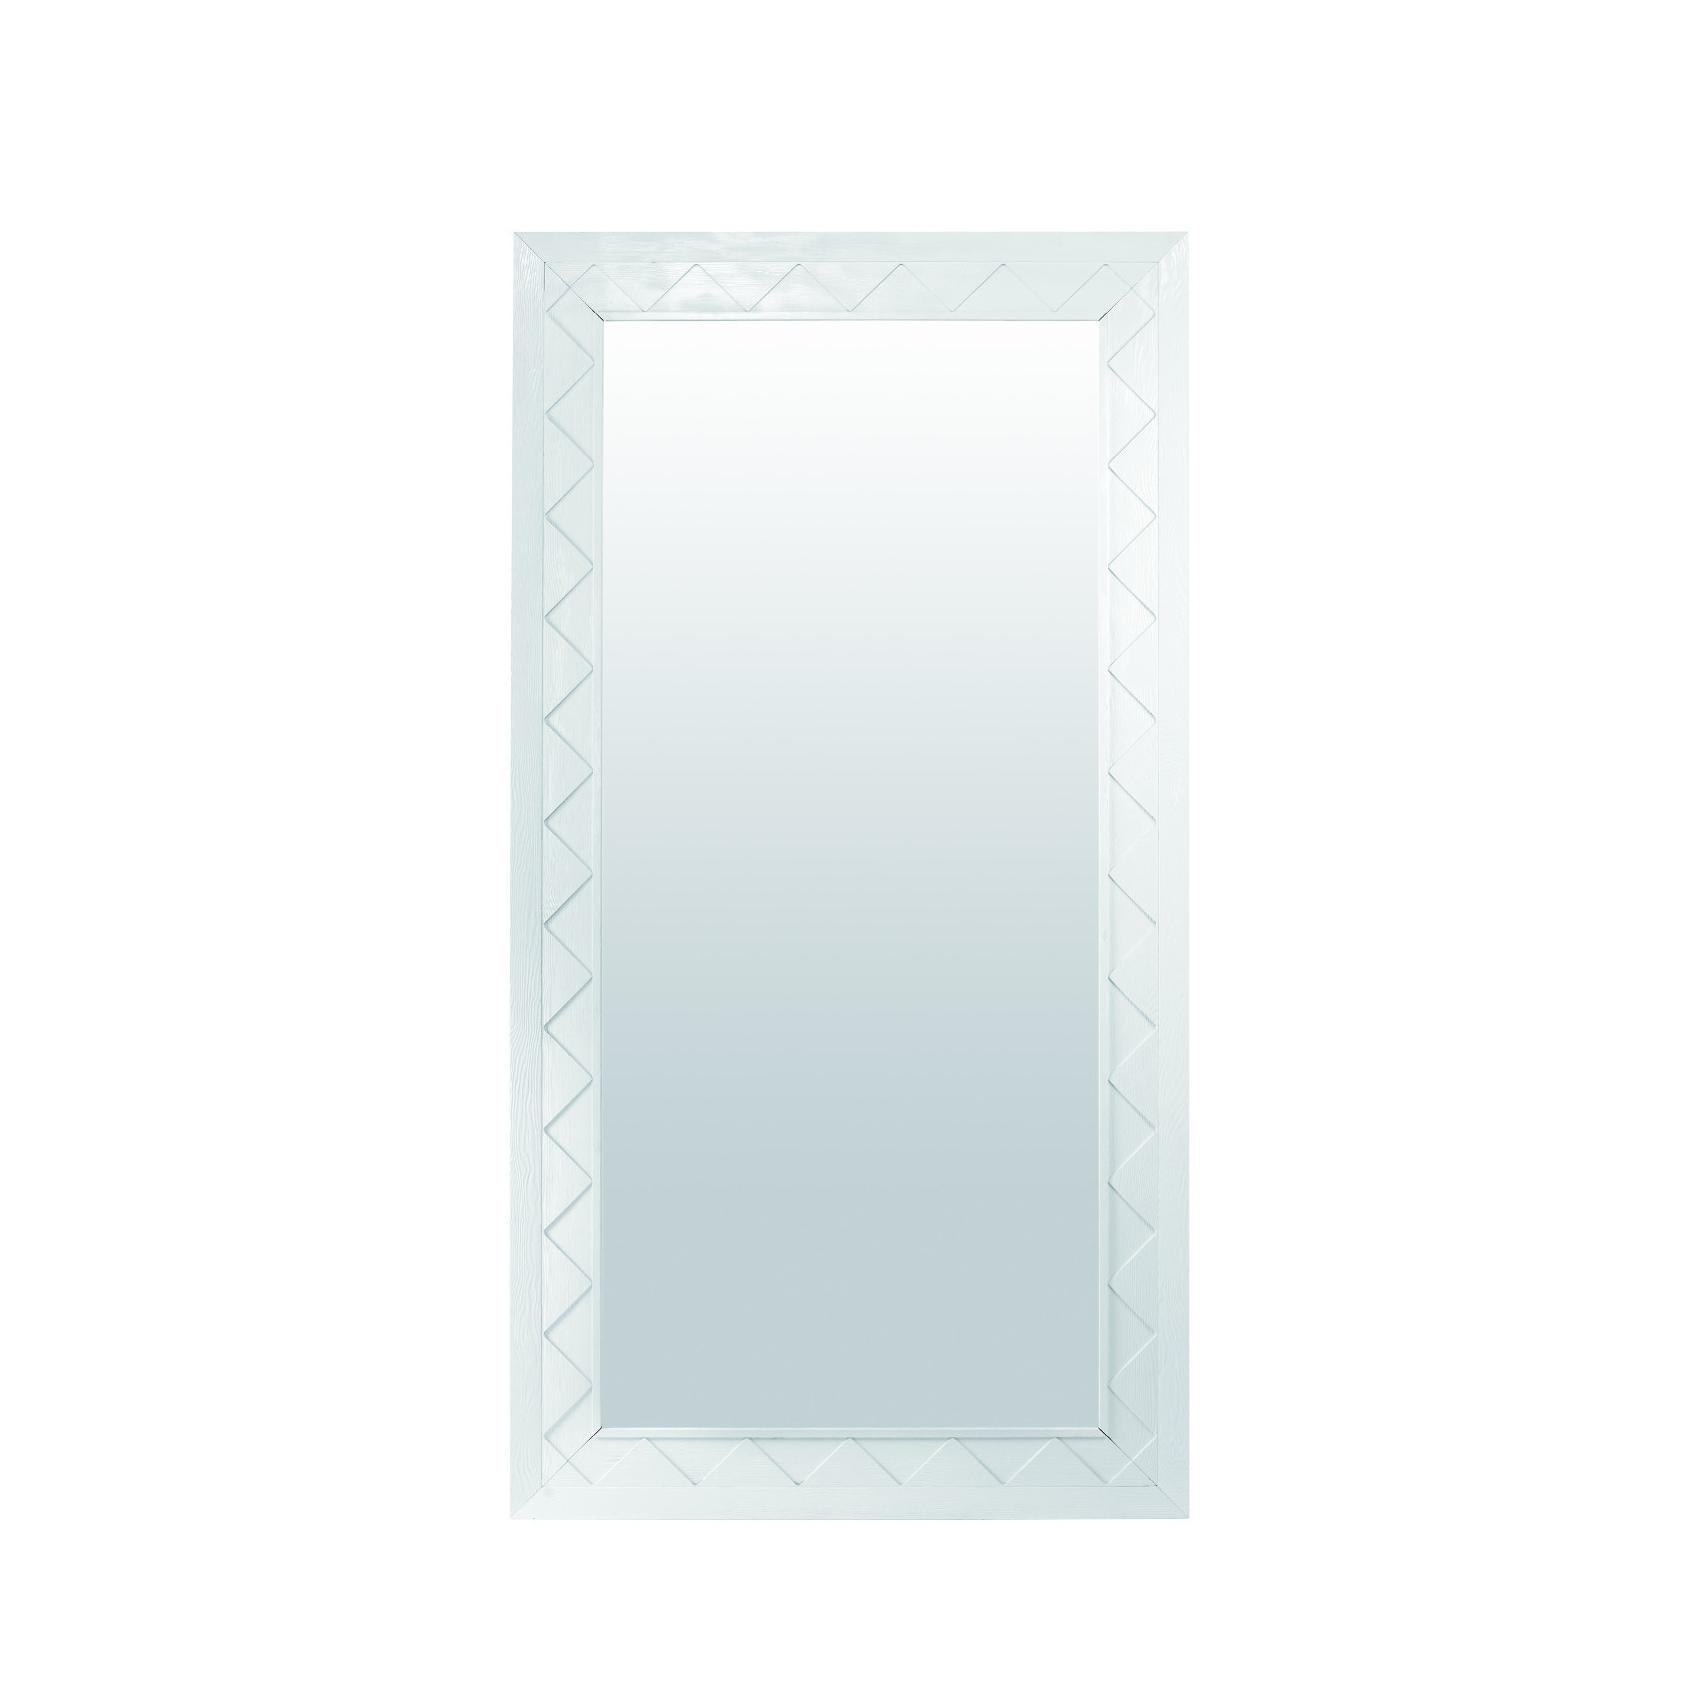 Circe mirror - Philippe Hurel